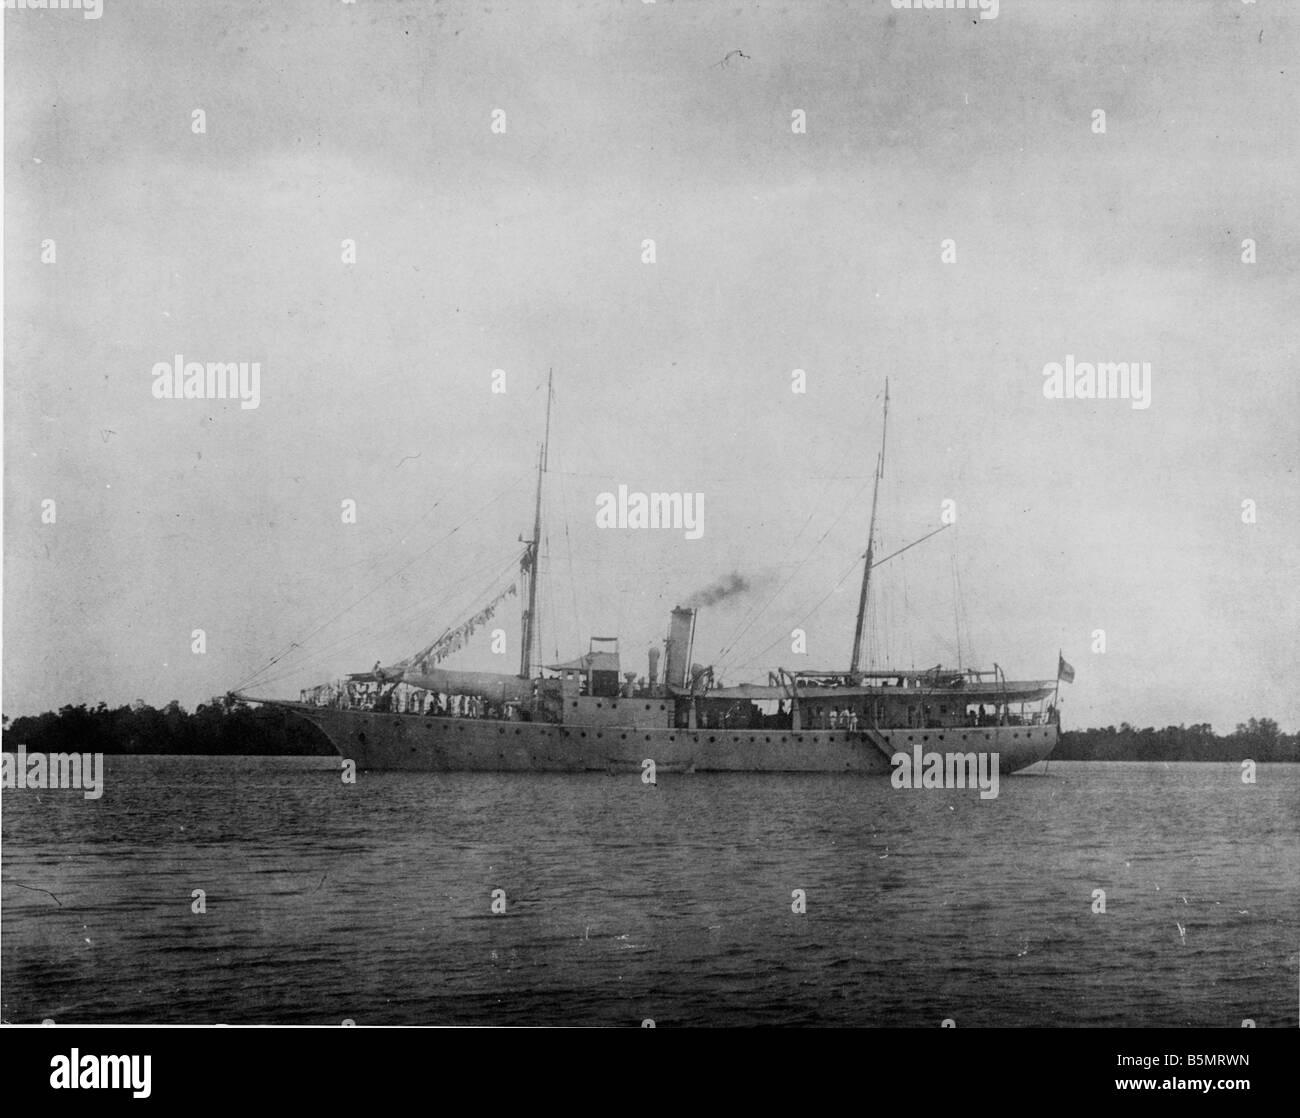 S M S Moewe in Rufidji Photo German East Africa now Tanzania as a German colony 1884 1920 S M S Moewe in Rufidji Photo 1914 Stock Photo